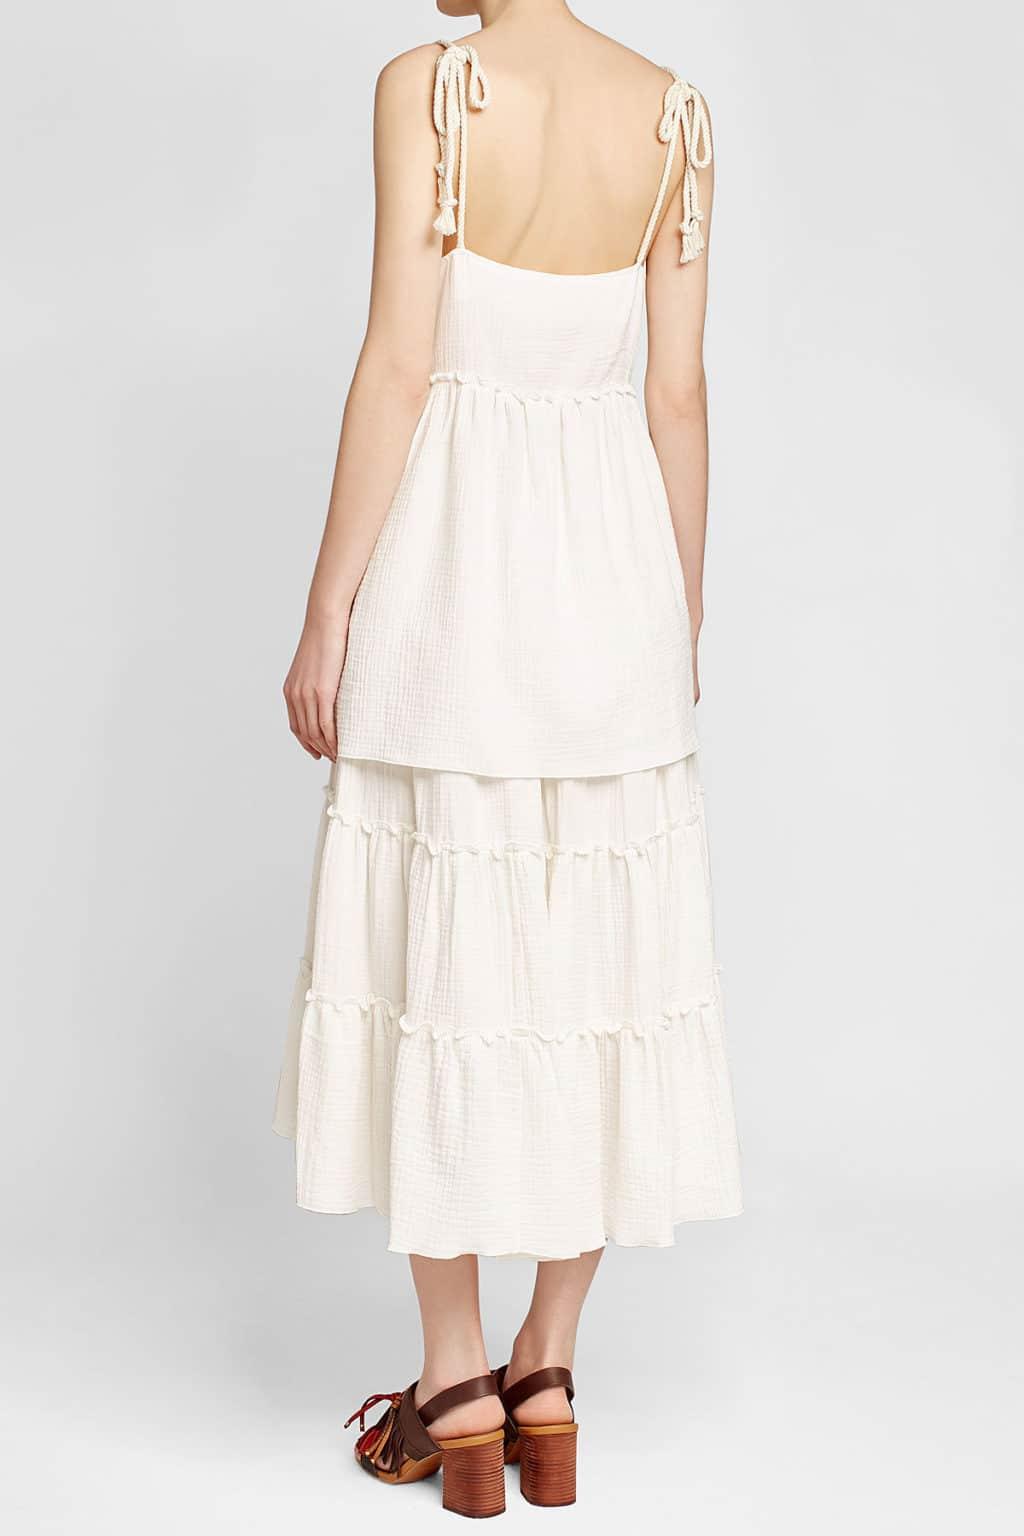 See By ChloÉ Cotton Mini Rope Straps White Dress